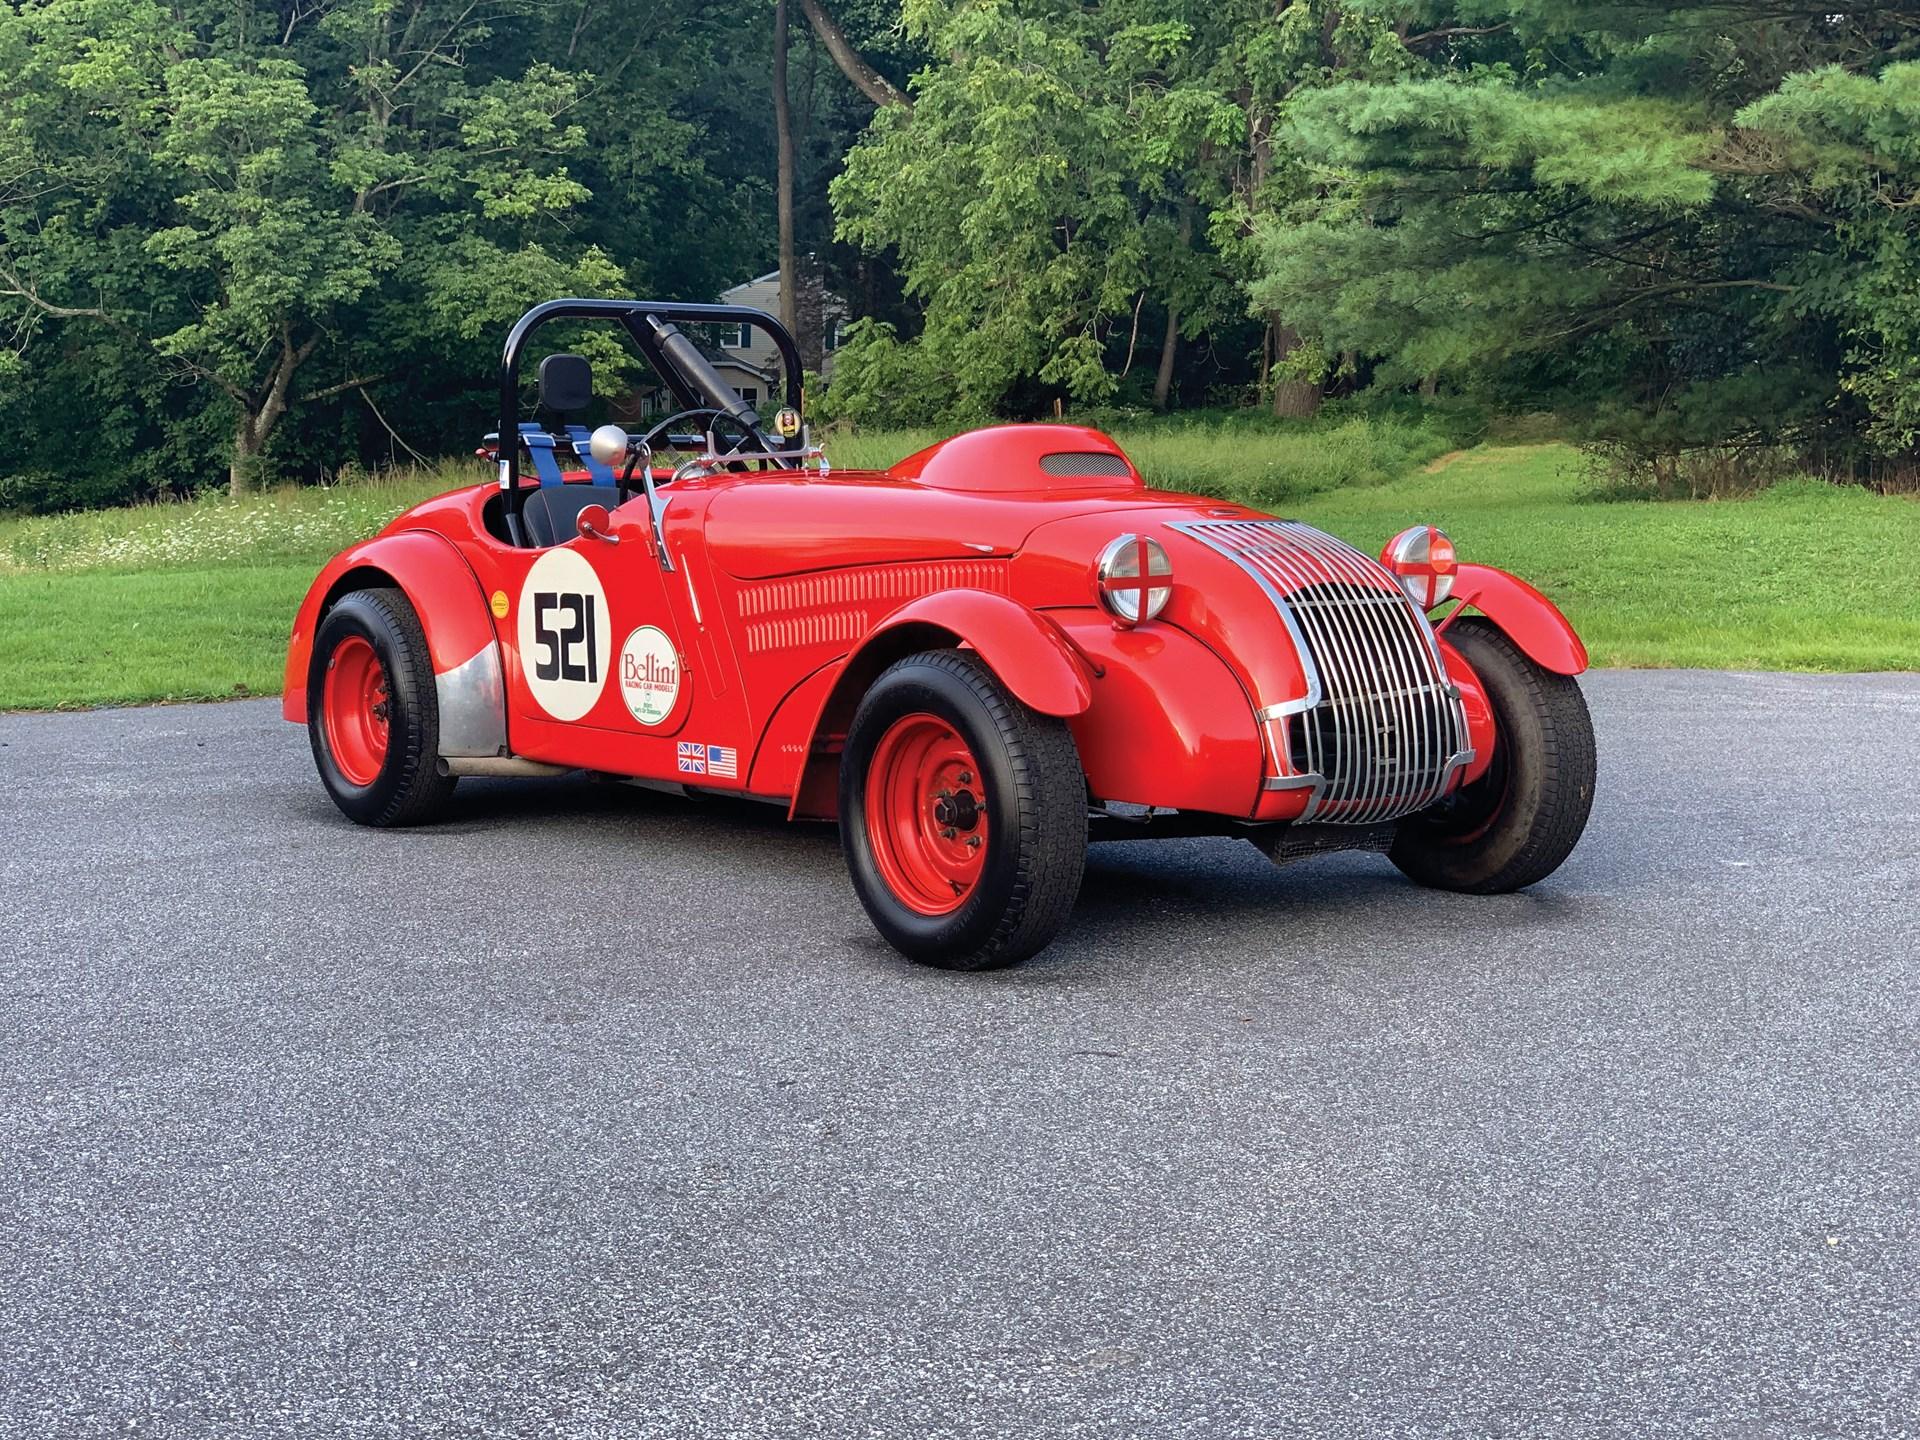 1948 Allard K1 sold for $50,600